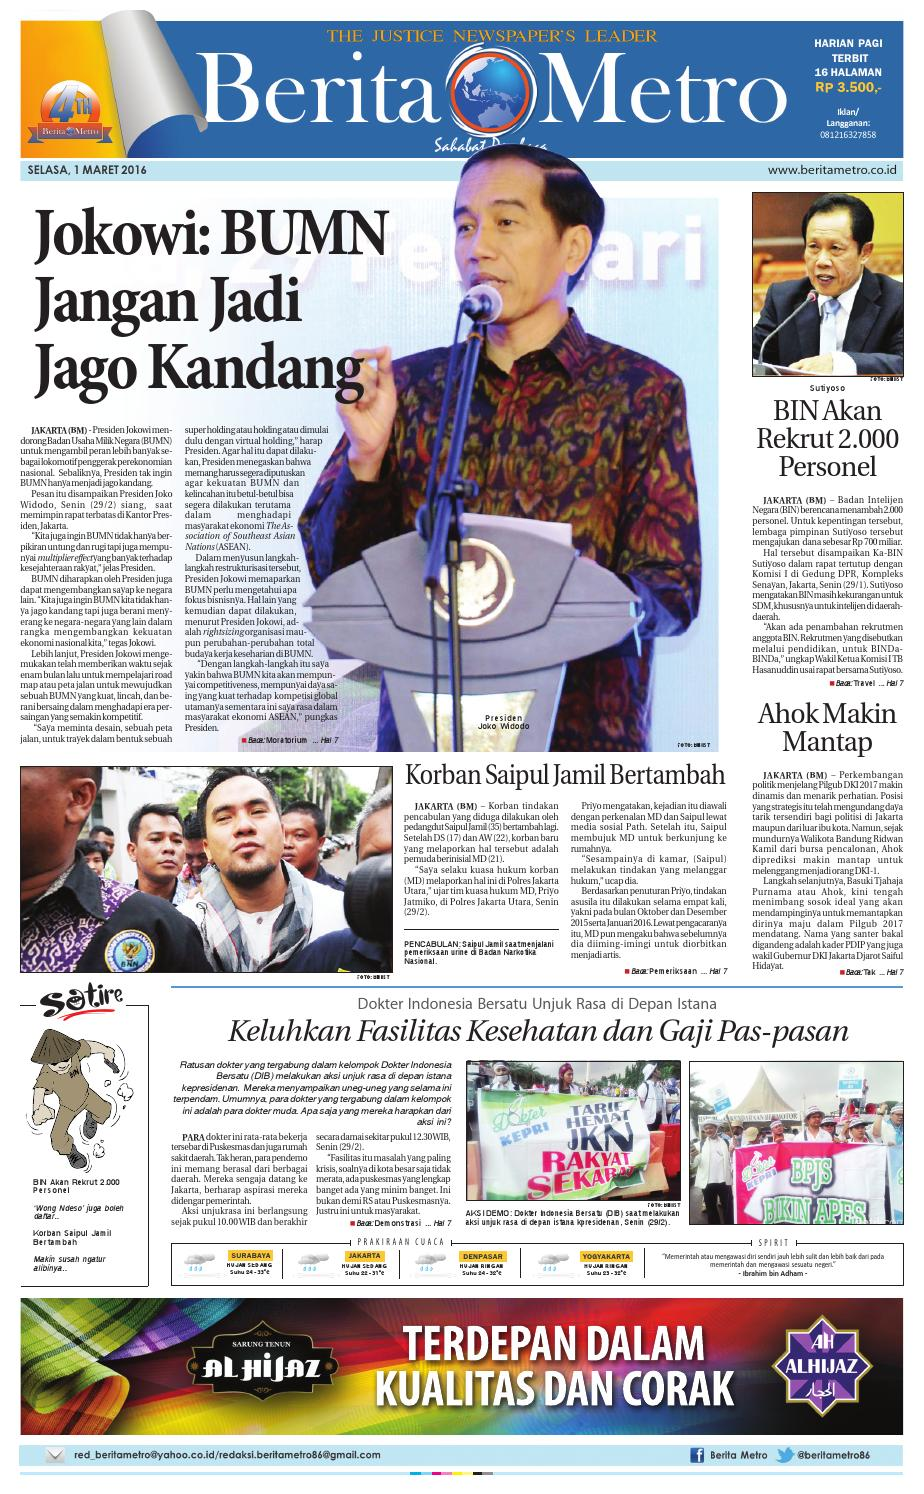 Radar Pekalongan 17 Februari 2017 By Issuu Produk Ukm Bumn Batik Tulis Babon Angrem Berita Metro 1 Maret 2016